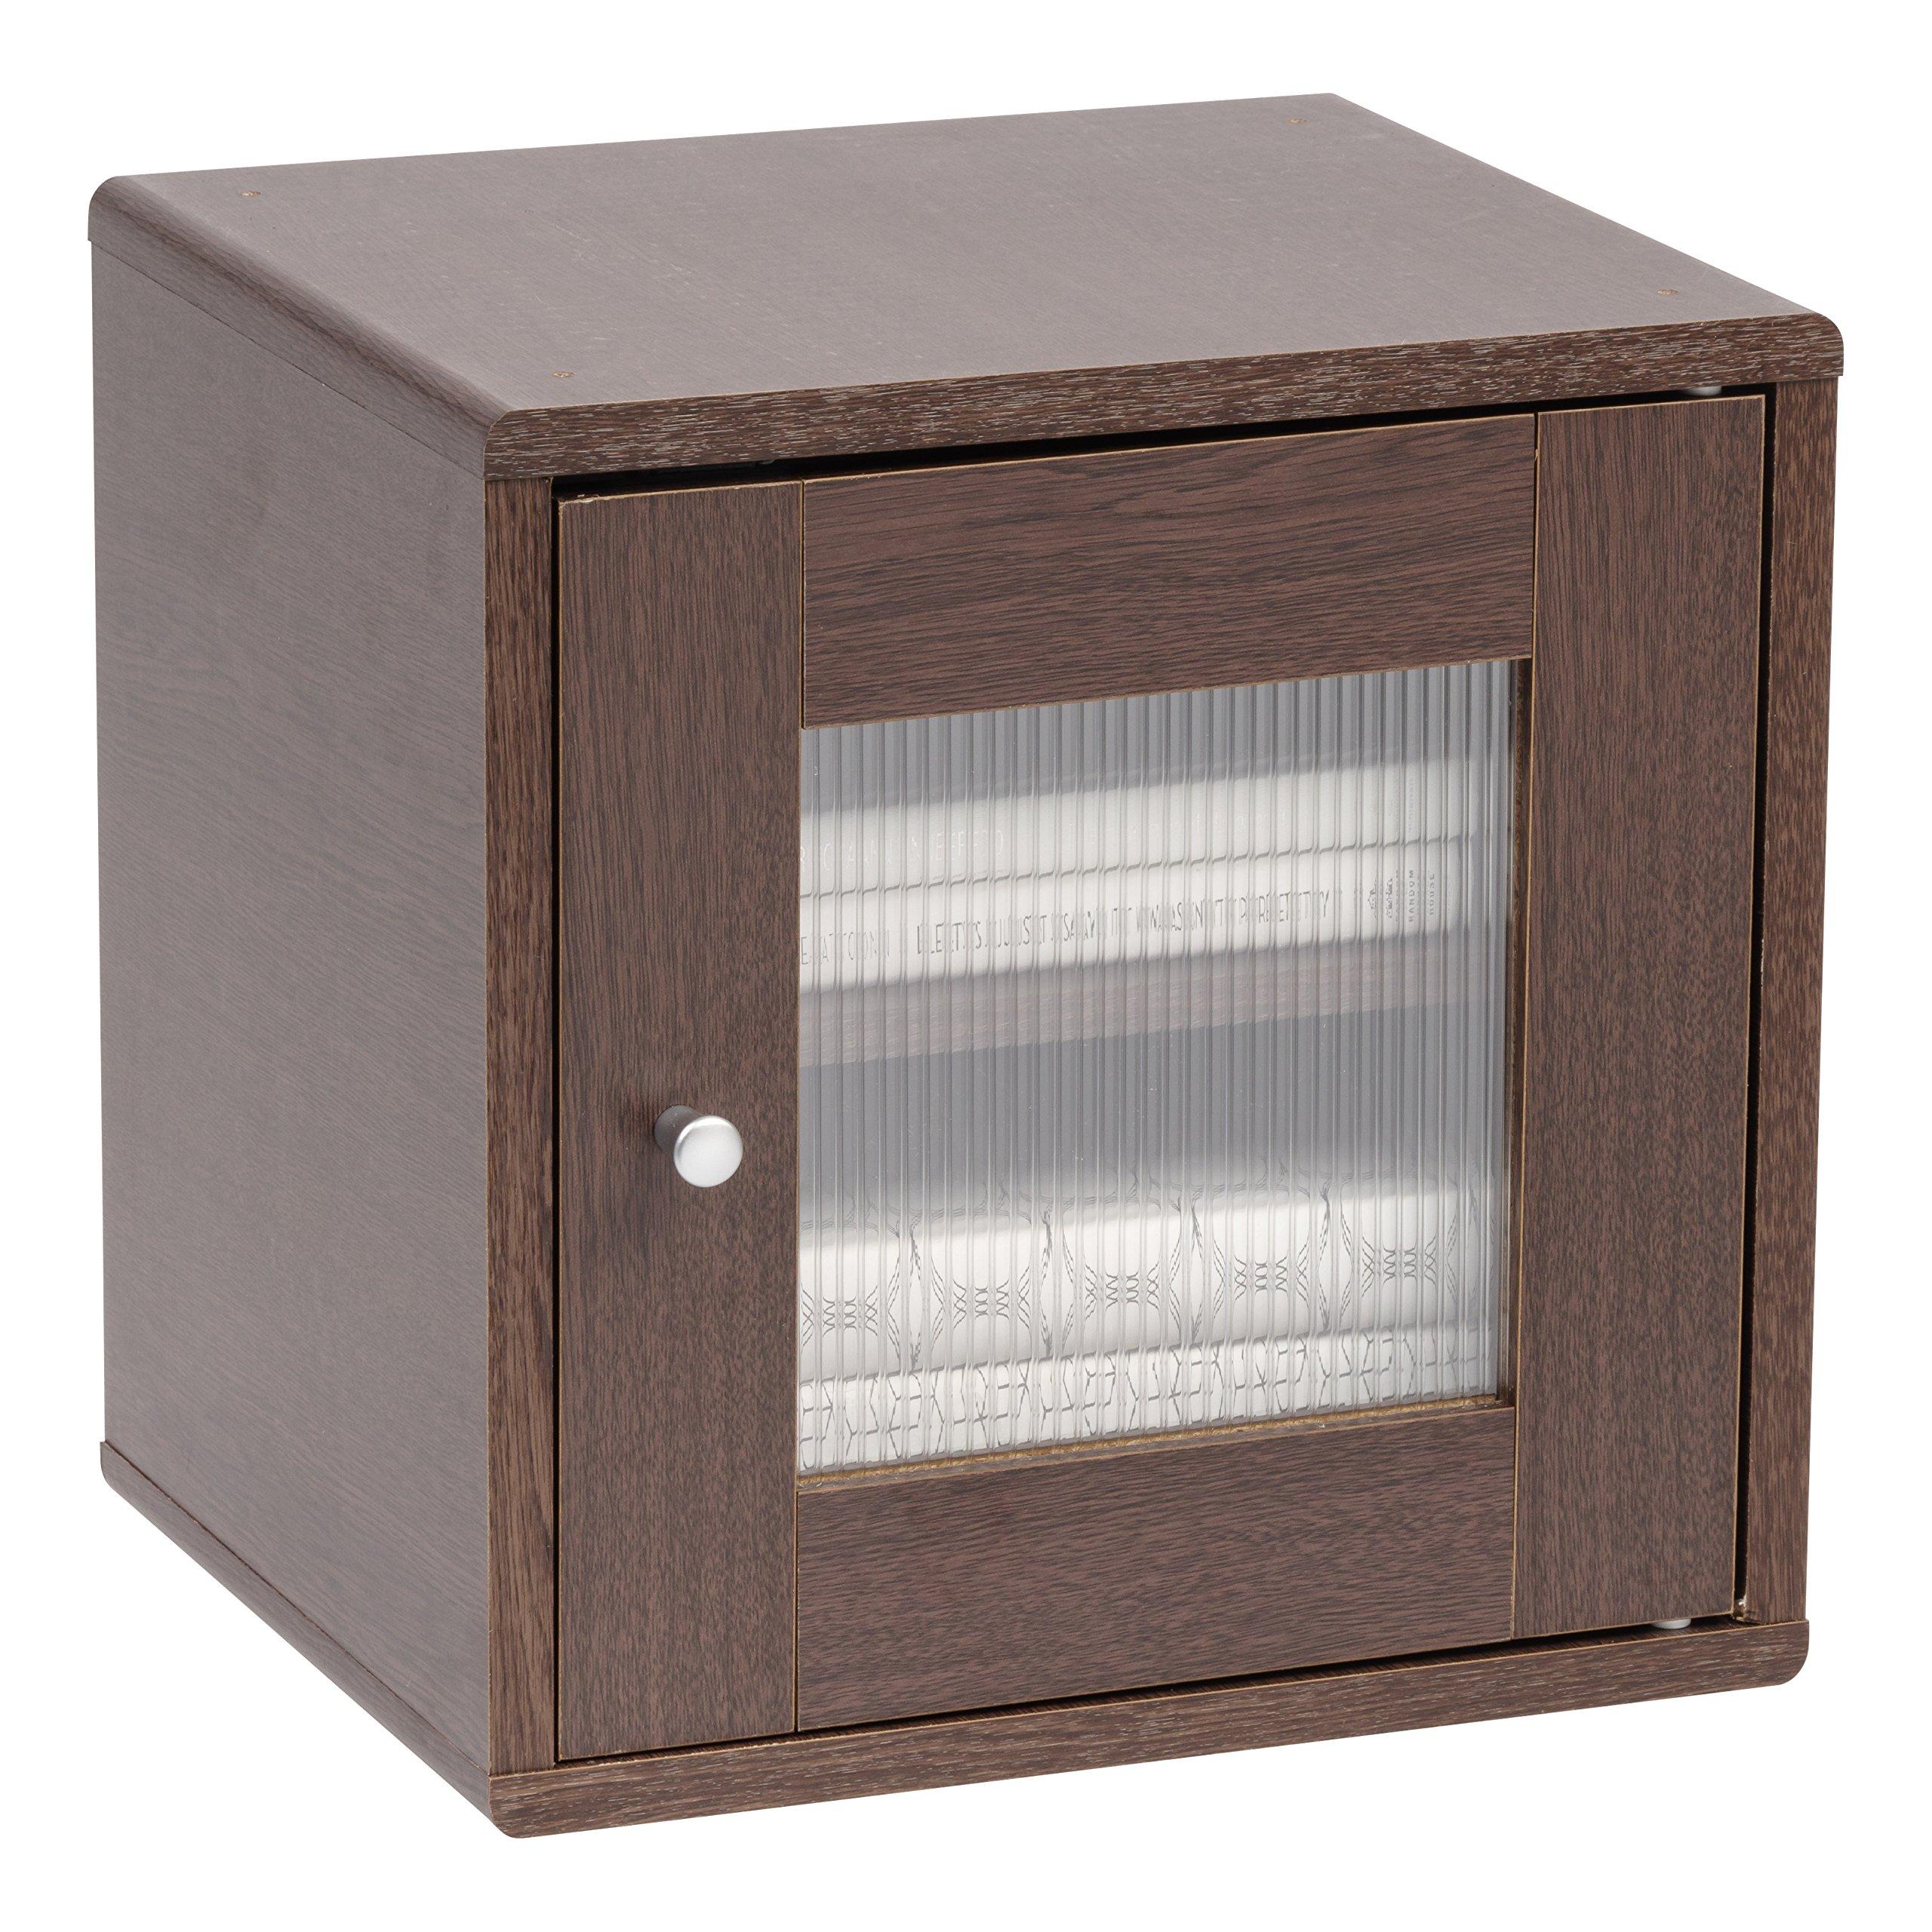 IRIS USA, QR-34PDT, Wood Storage Cube with Window Door, Brown Oak, 1 Pack by IRIS USA, Inc. (Image #5)